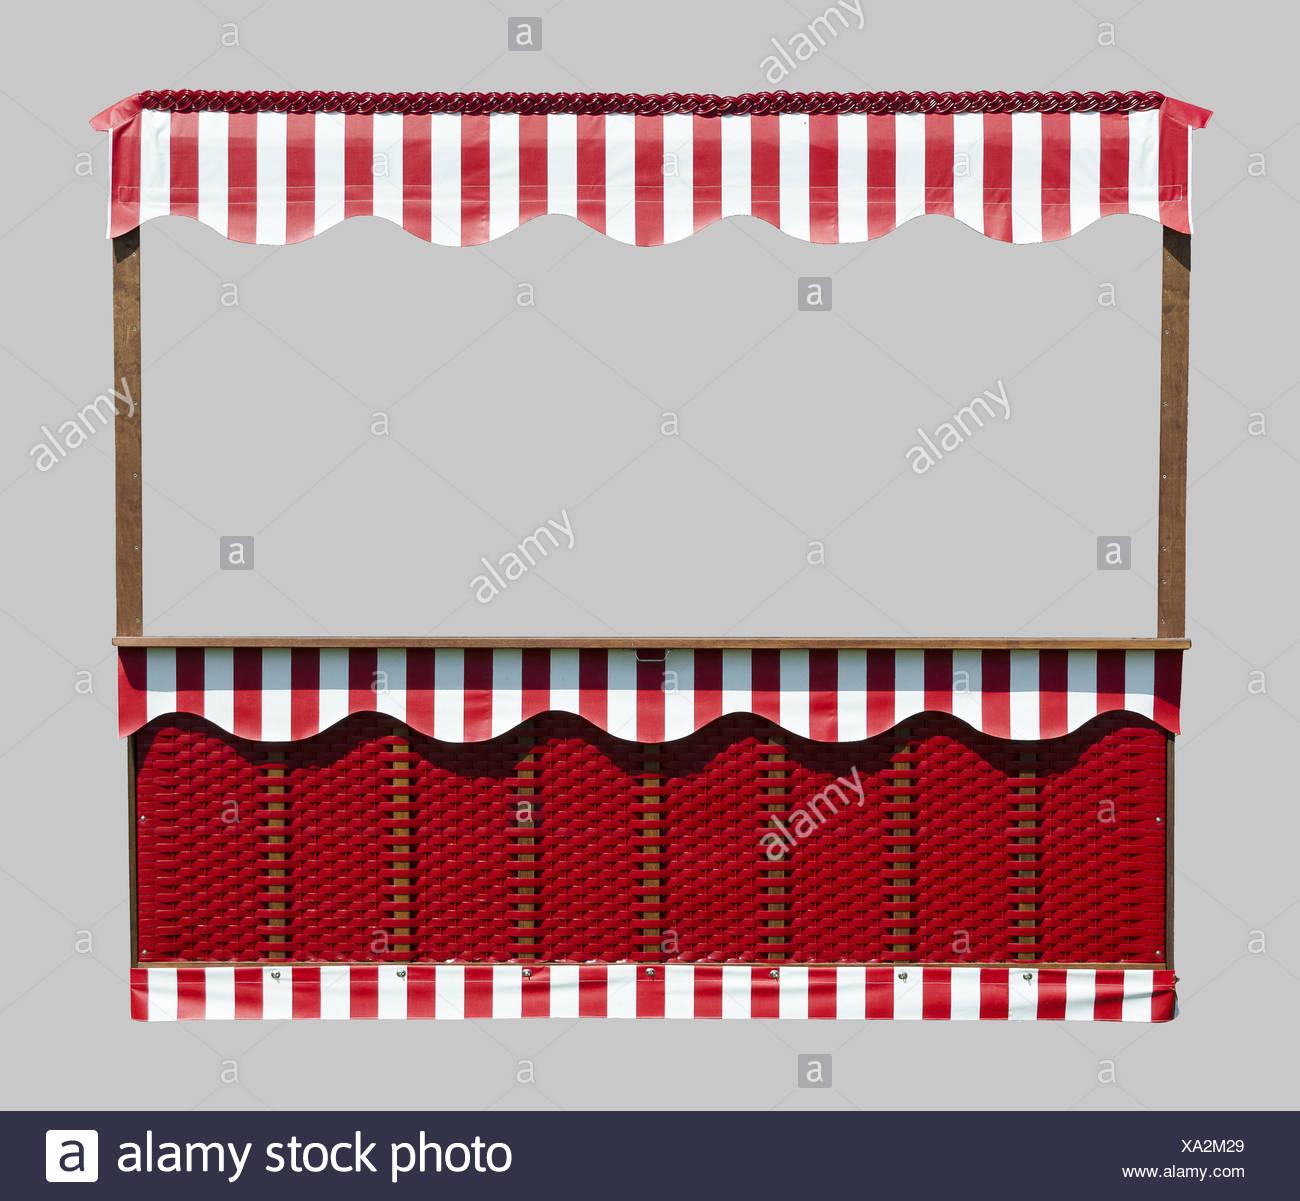 Stall With Basketwork Und Striped Sunblind